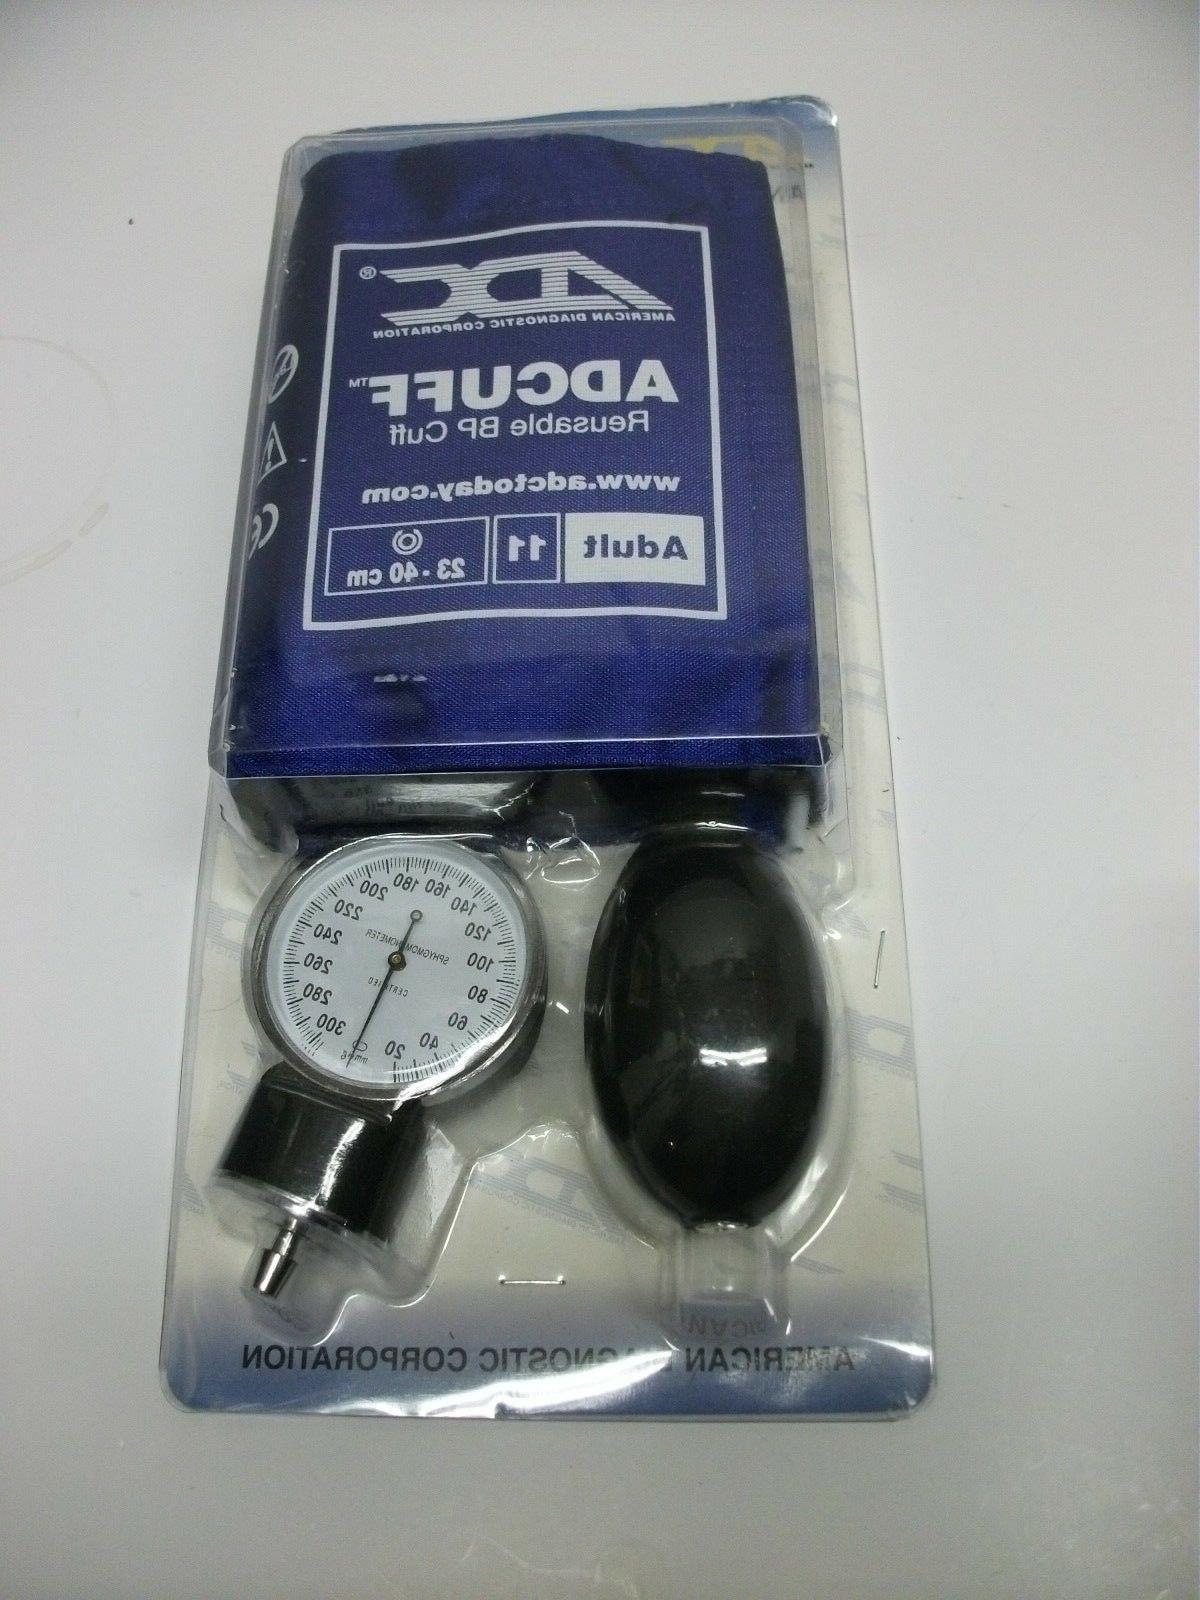 new uff blood pressure monitor nylon cuff